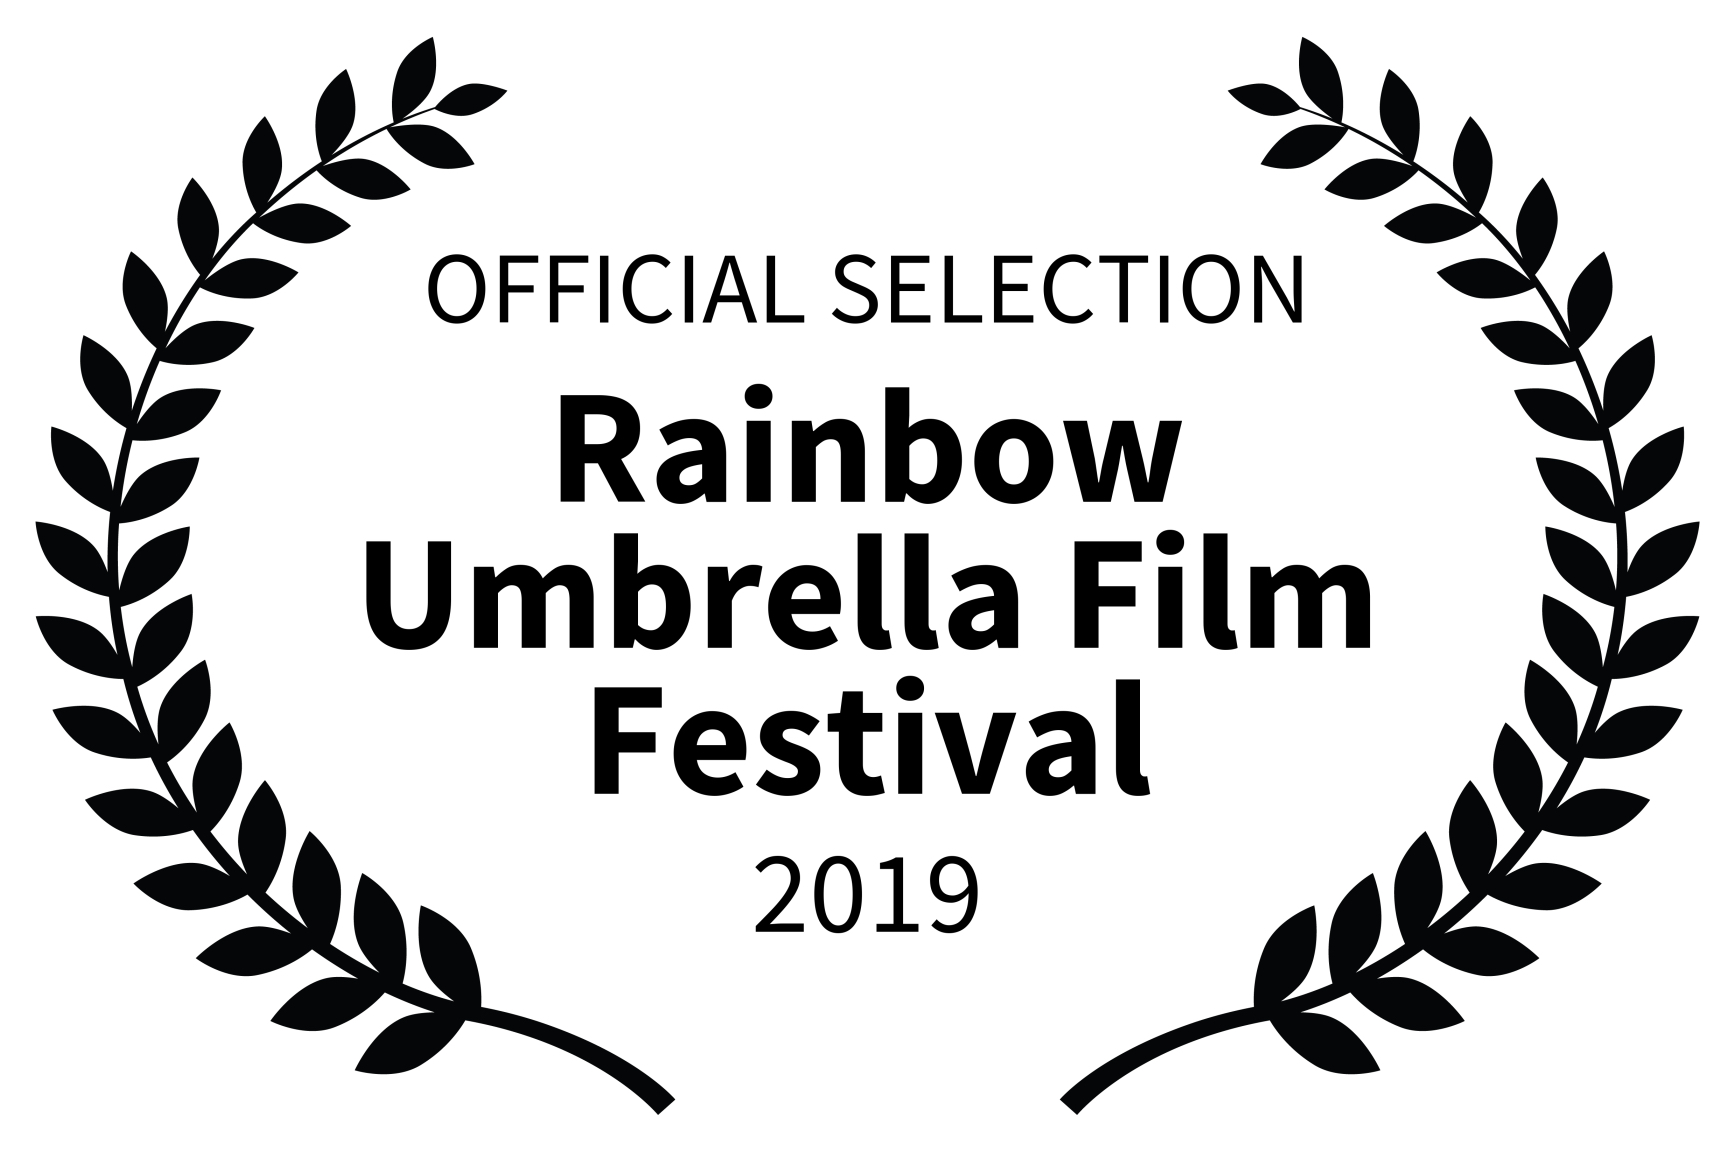 OFFICIAL SELECTION - Rainbow Umbrella Film Festival - 2019.jpg